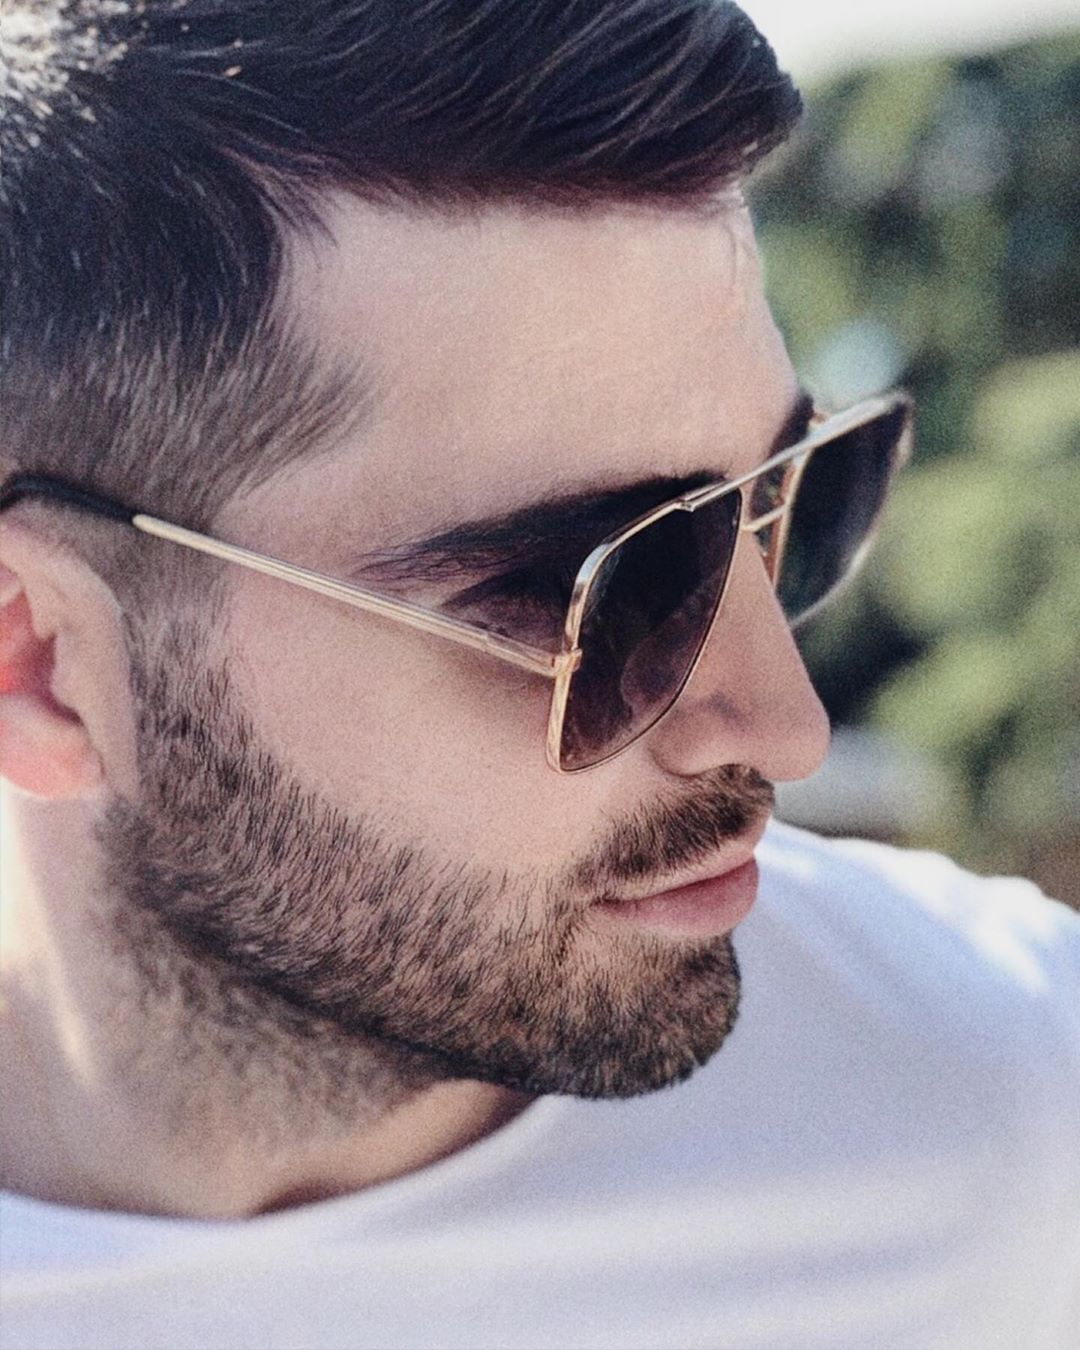 Designer Sunglasses for Dads